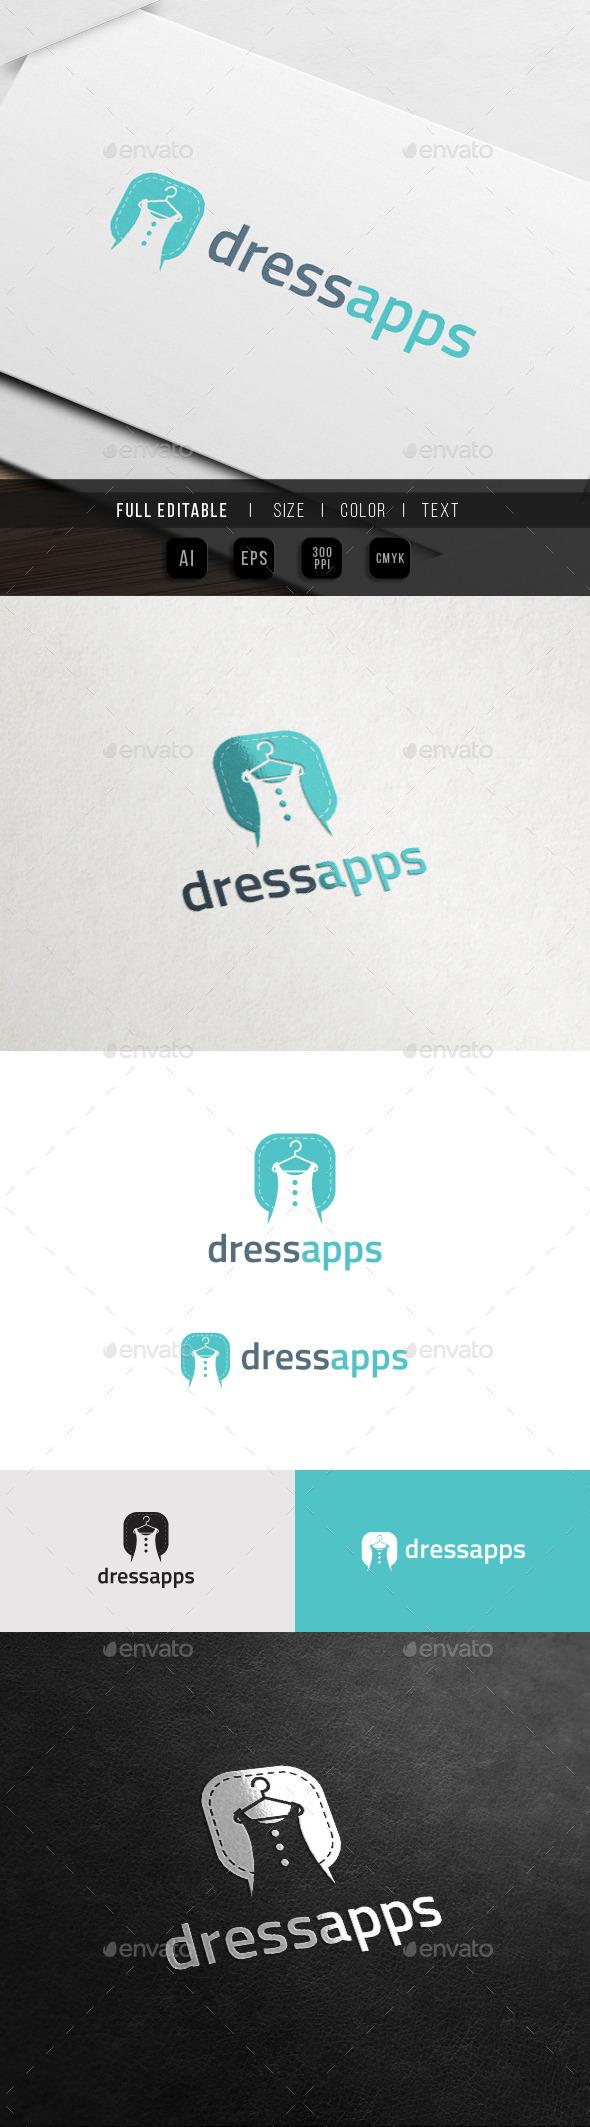 GraphicRiver Dress App Fashion Boutique e-Commerce 10972445